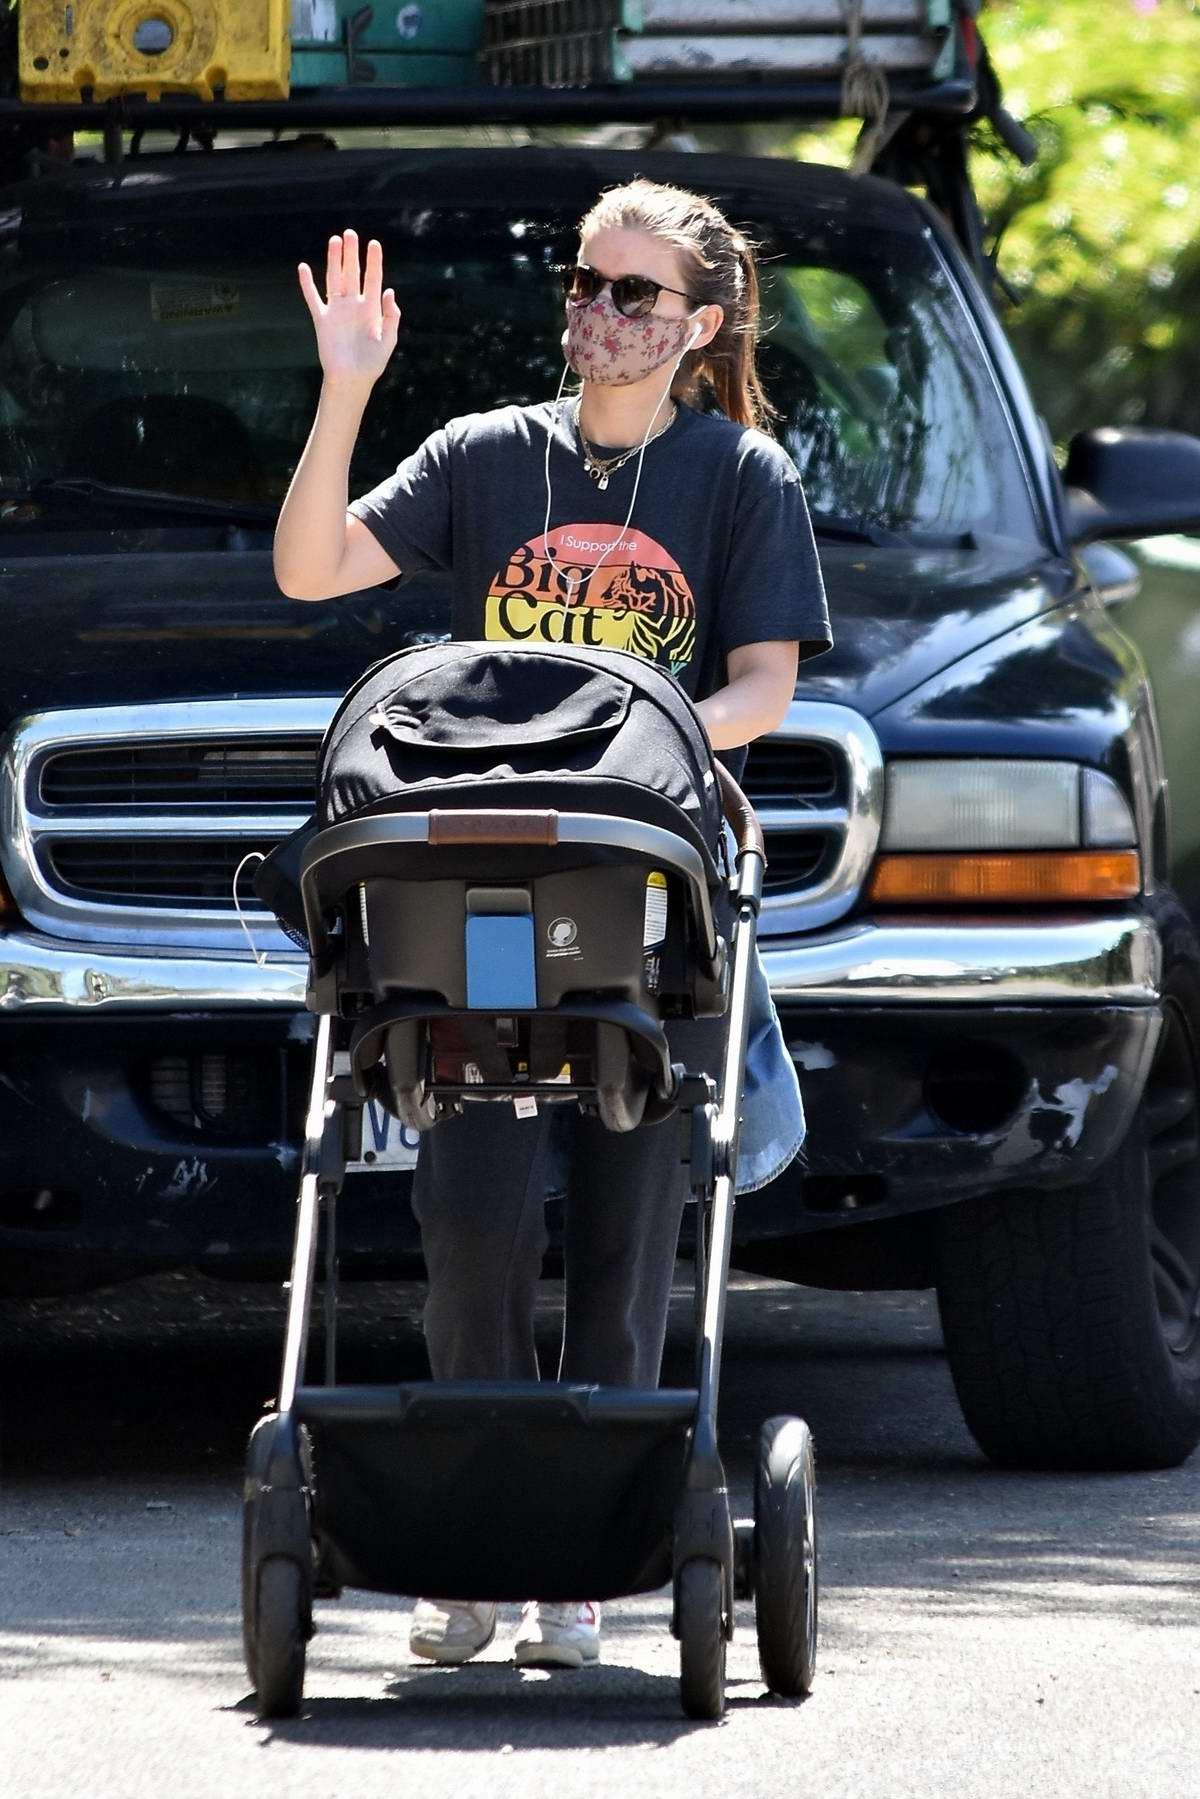 Kate Mara takes a walk with her baby around the neighborhood in Los Feliz, California